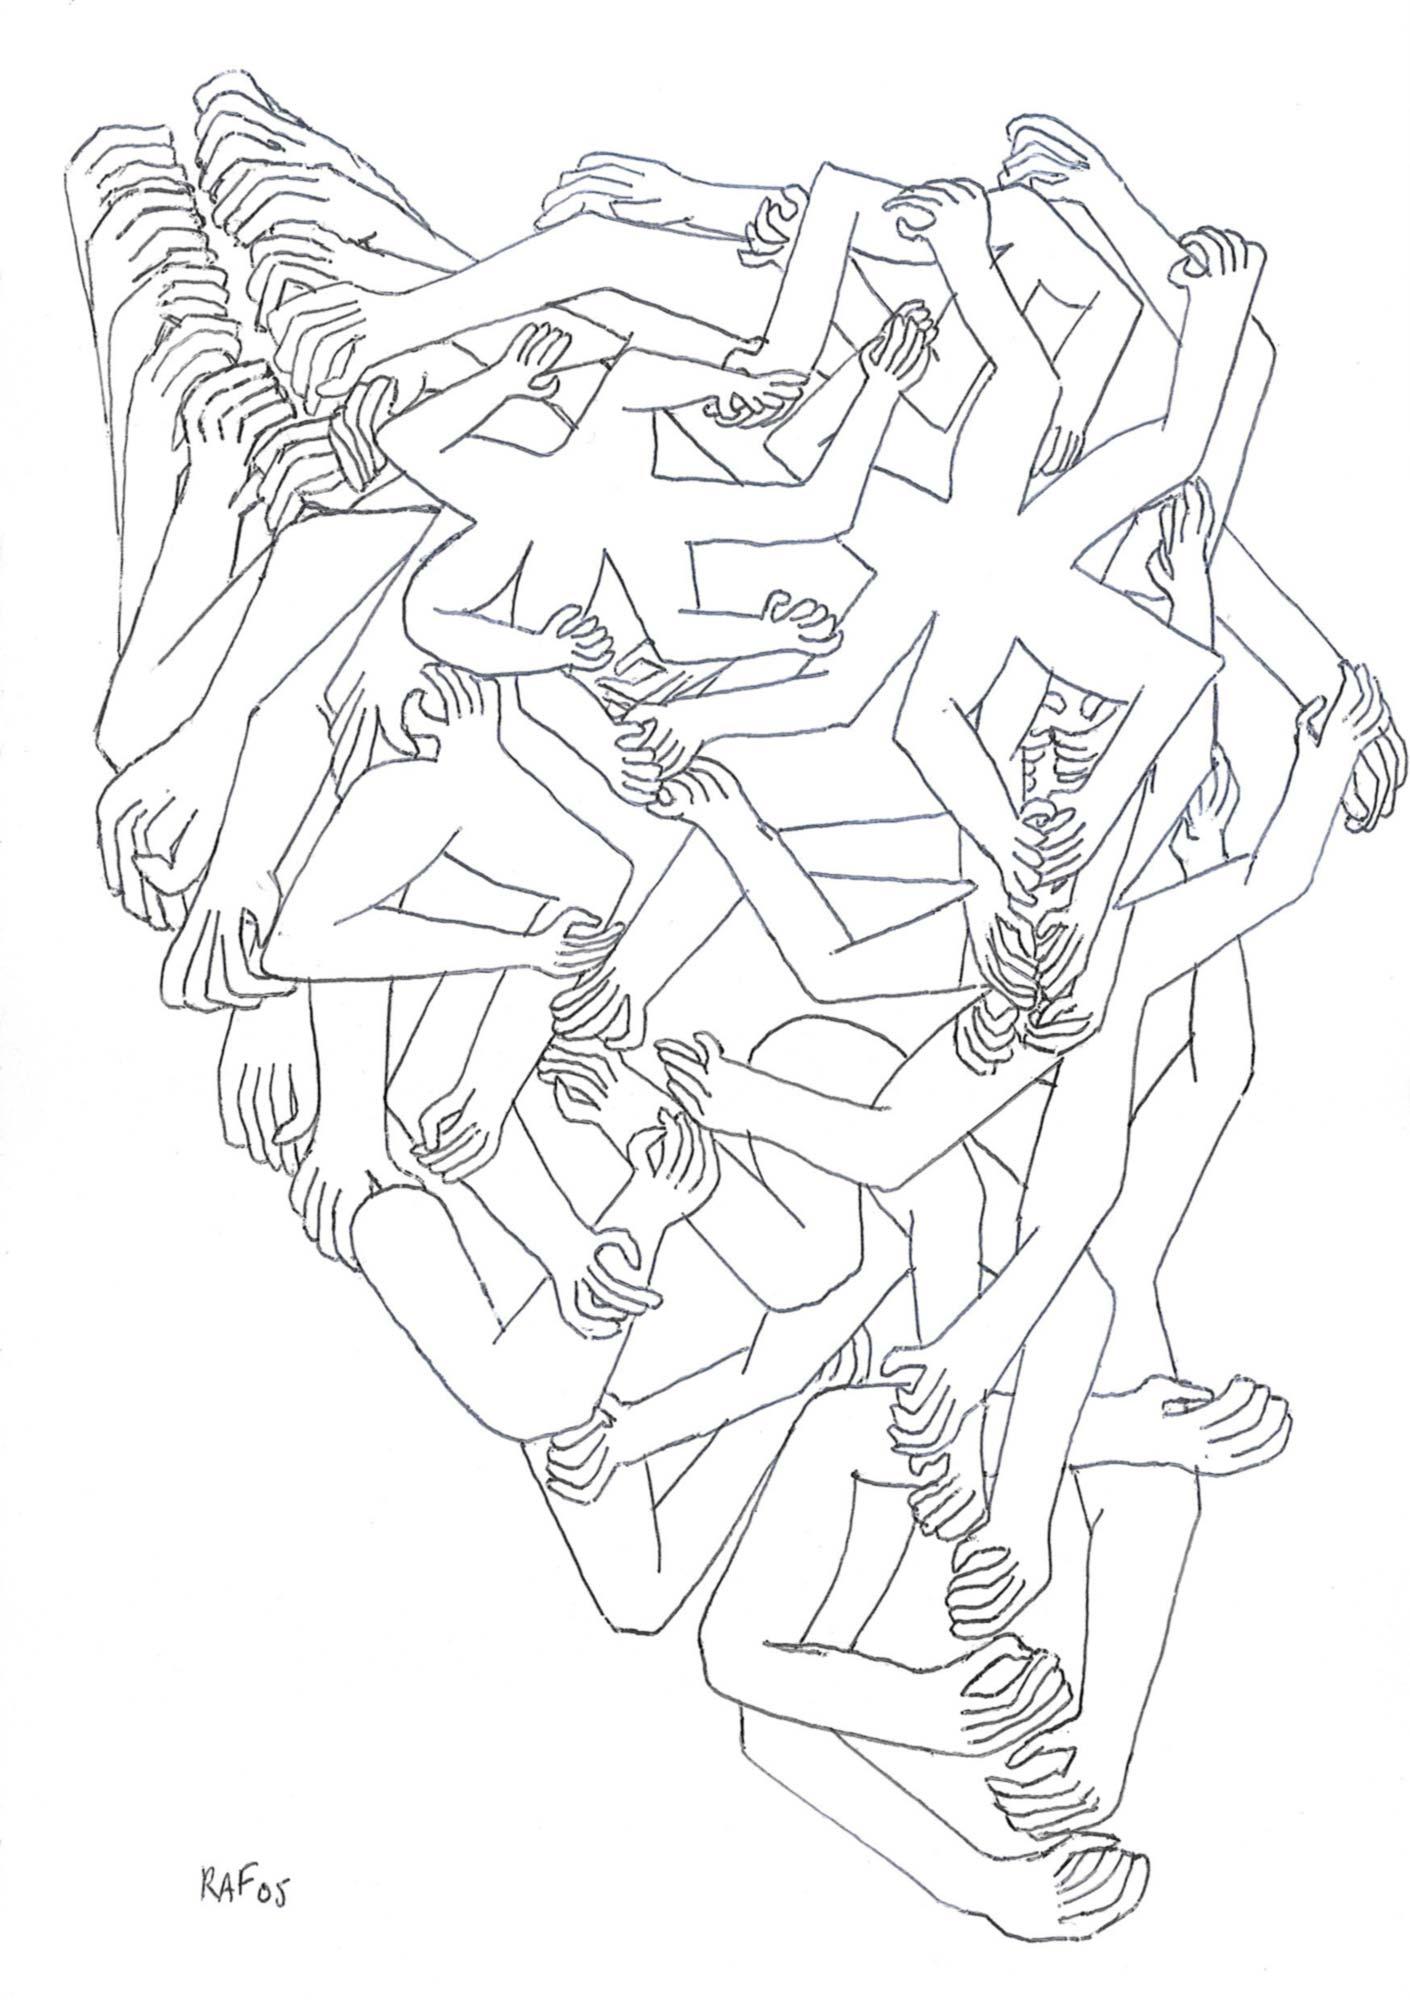 La fourmilière, dessin, Raf Listowski, 2005